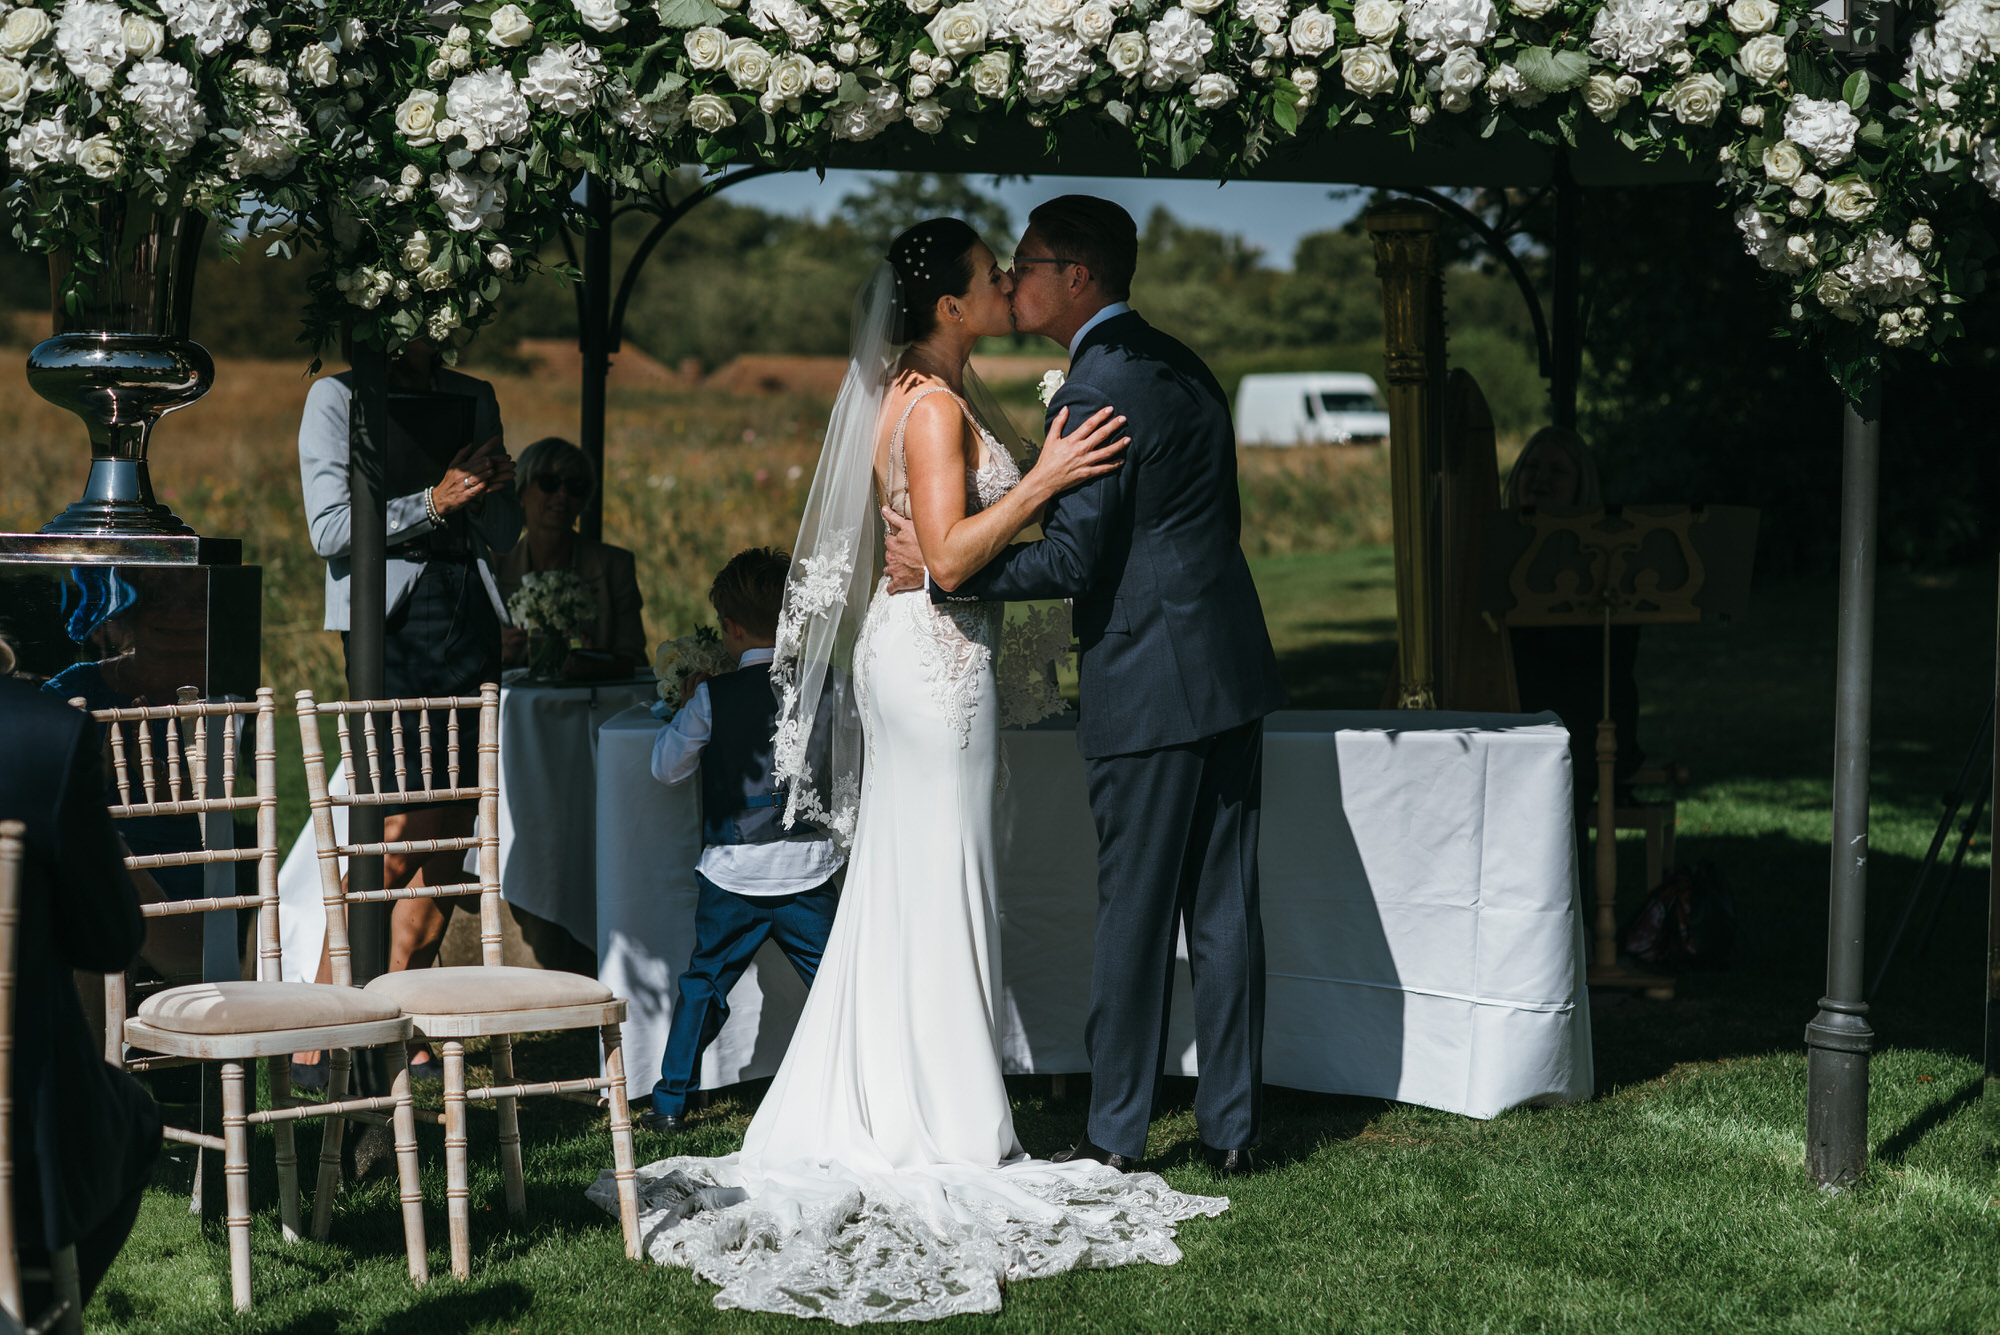 First kiss Coworth Park wedding